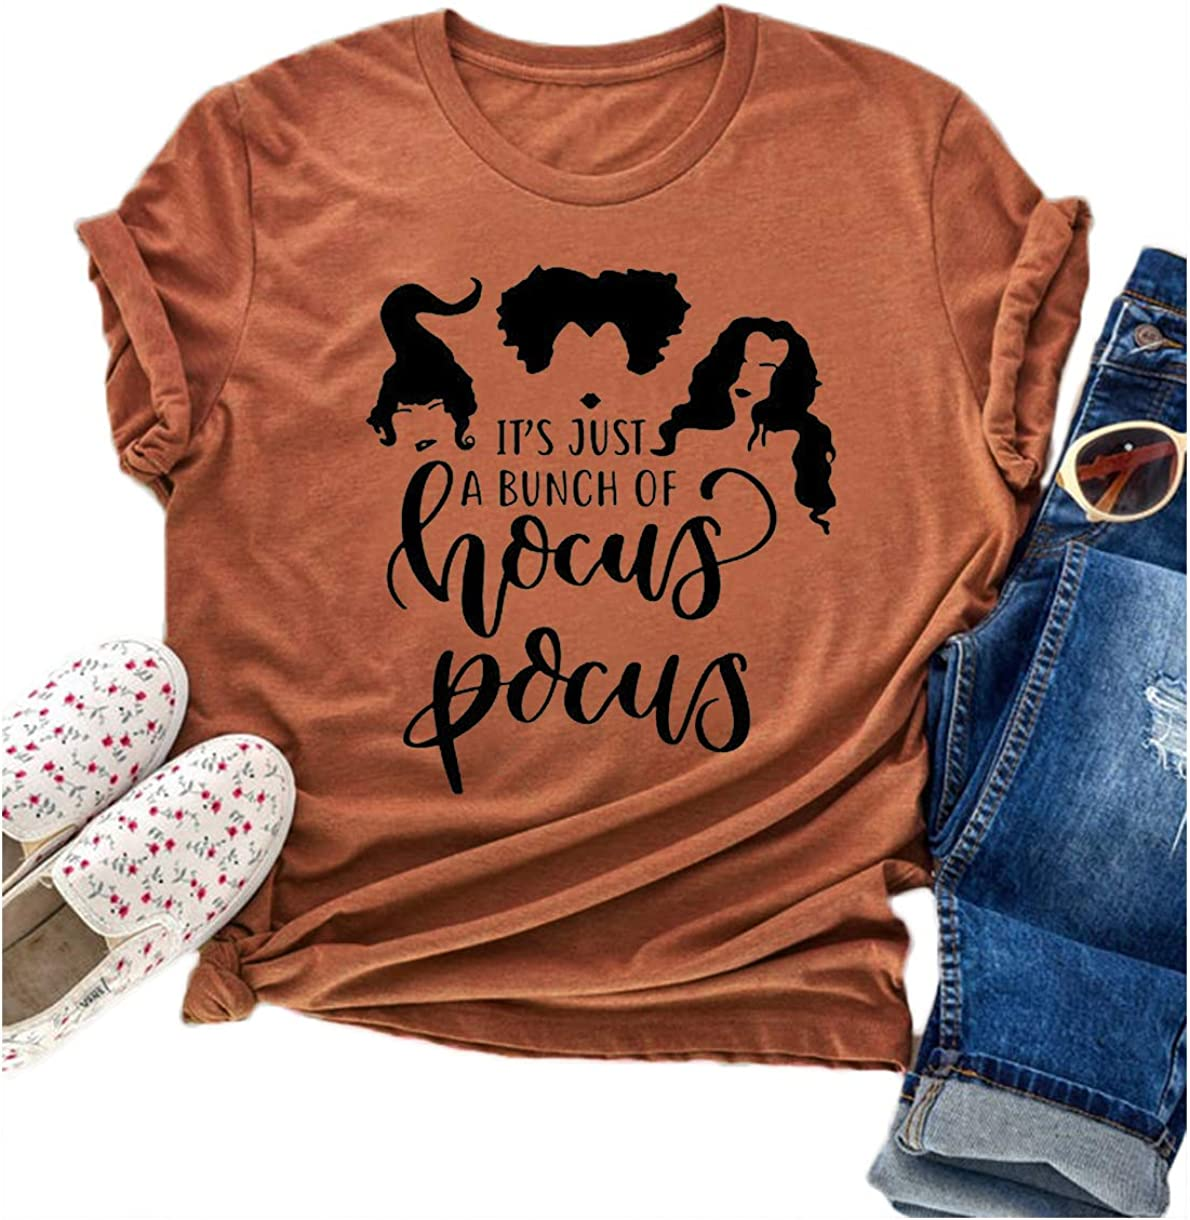 Tuwbue Hocus Pocus Shirt Womens Sanderson Sisters Shirts Halloween Costumes for Women